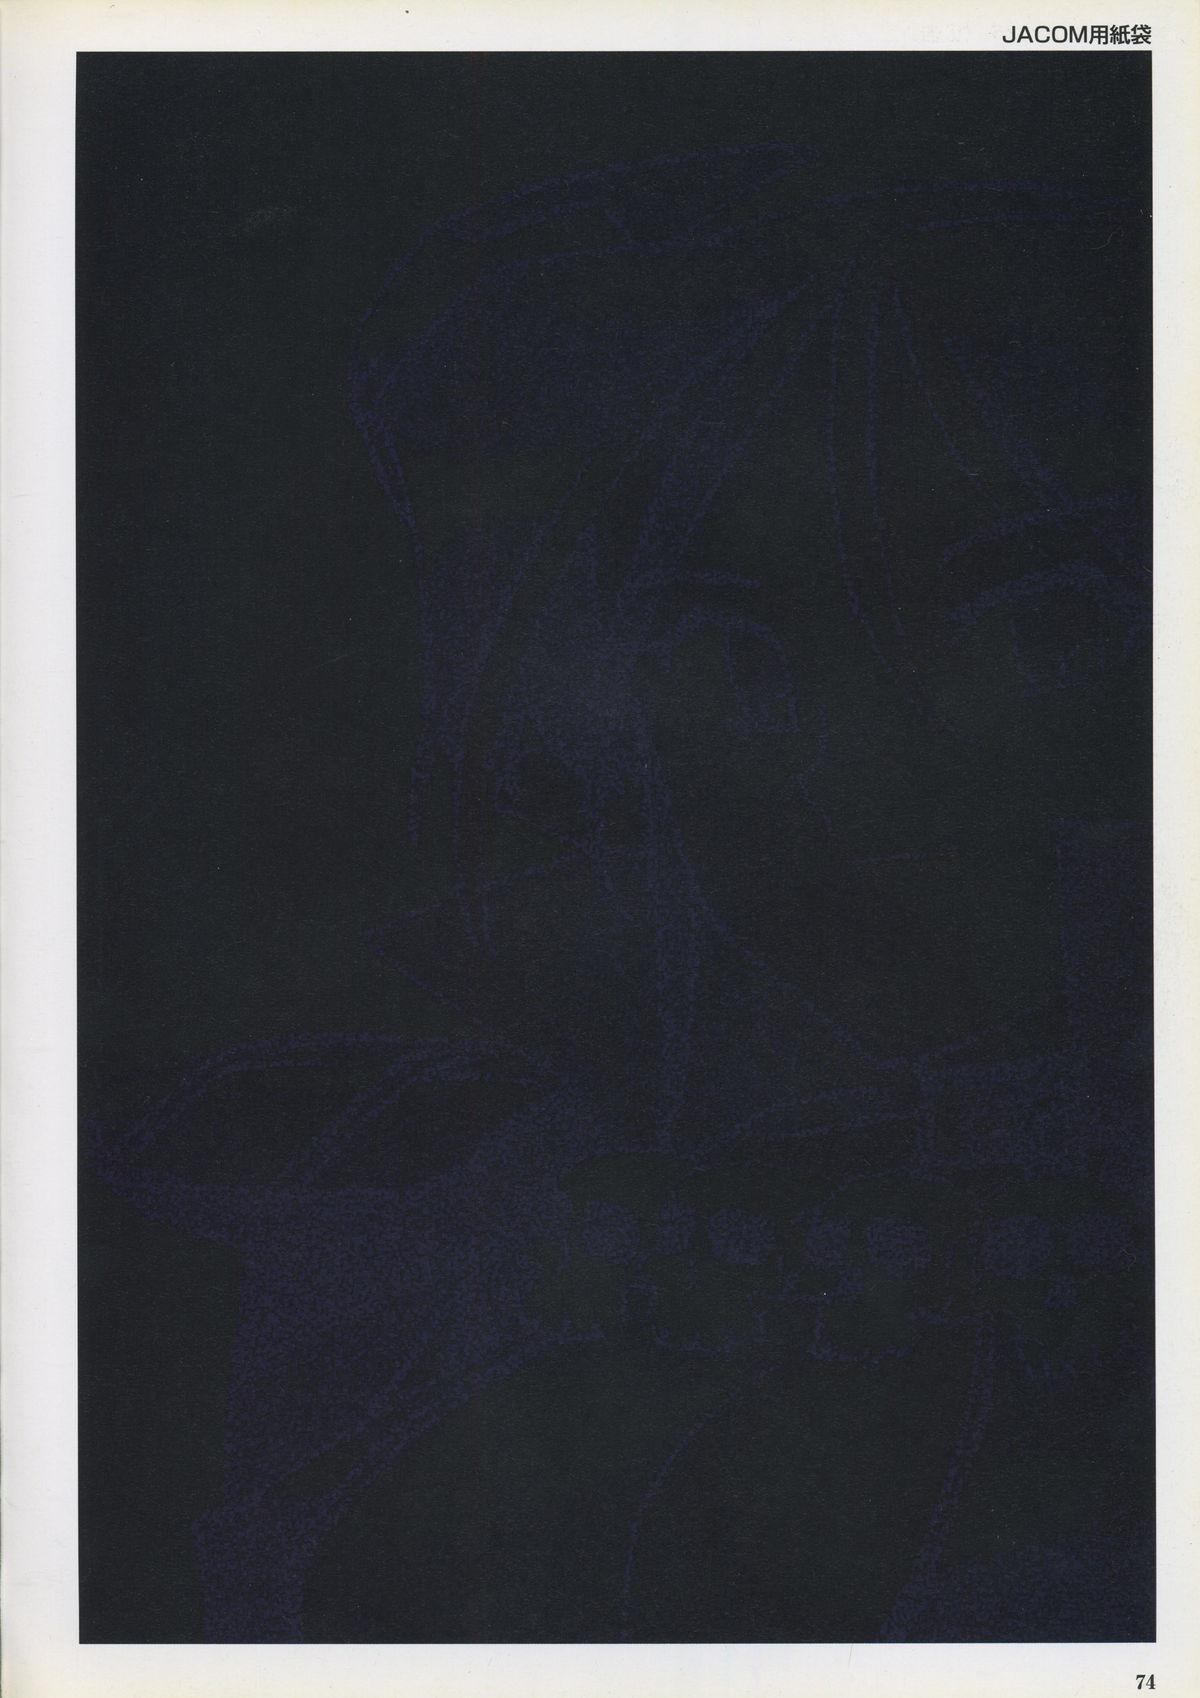 VIPER Series Official Artbook III 76